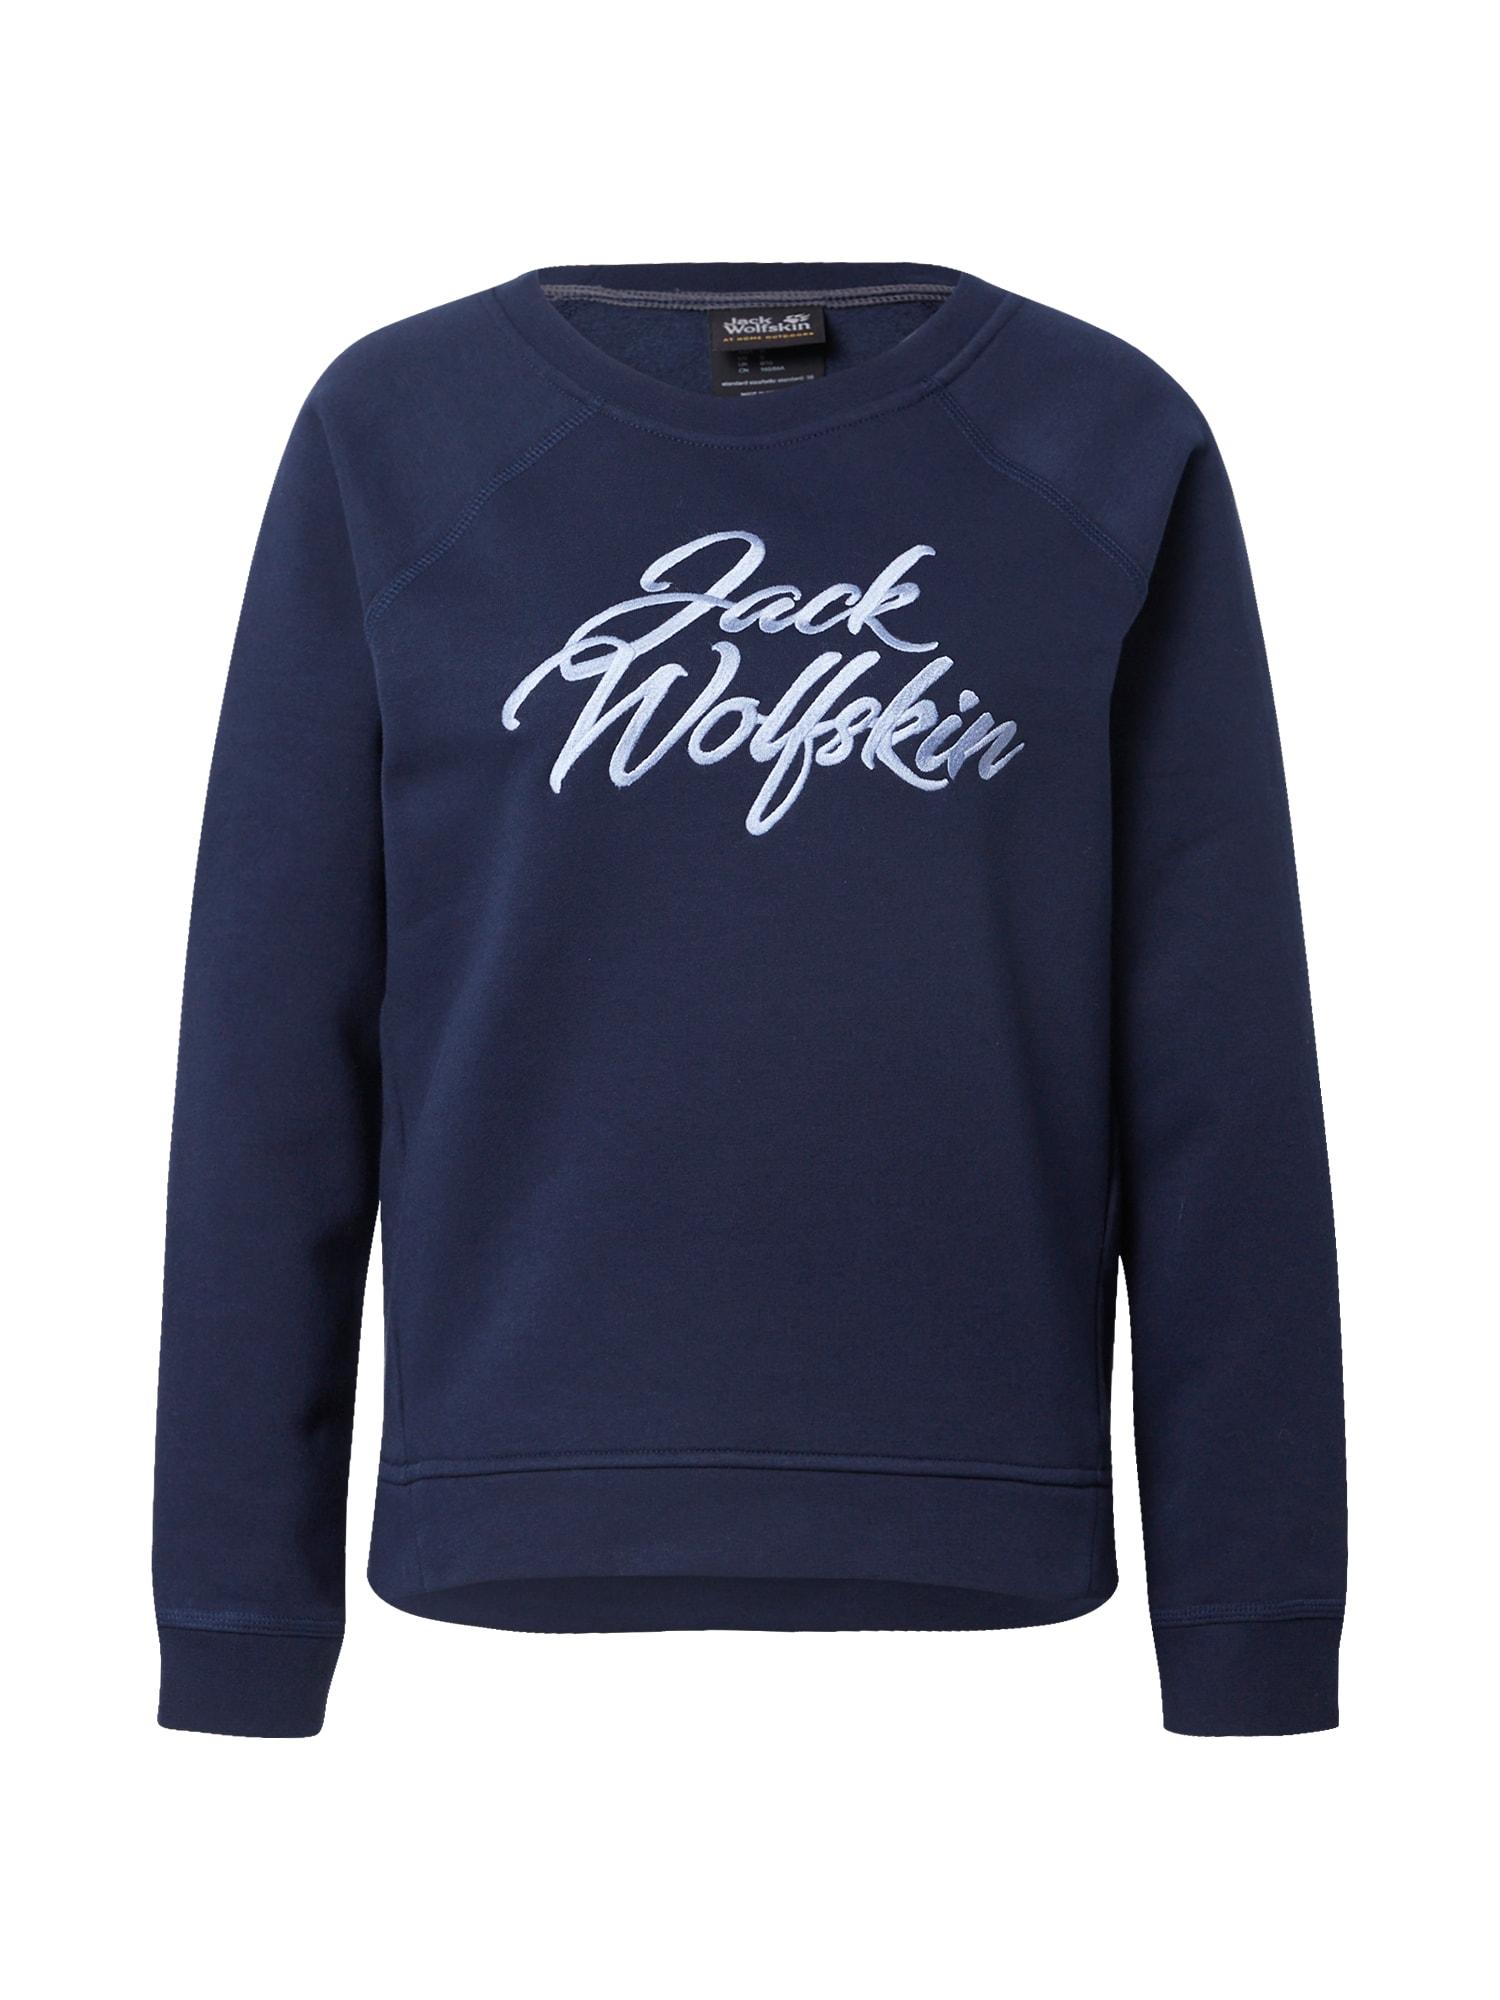 JACK WOLFSKIN Sportinio tipo megztinis tamsiai mėlyna / šviesiai mėlyna